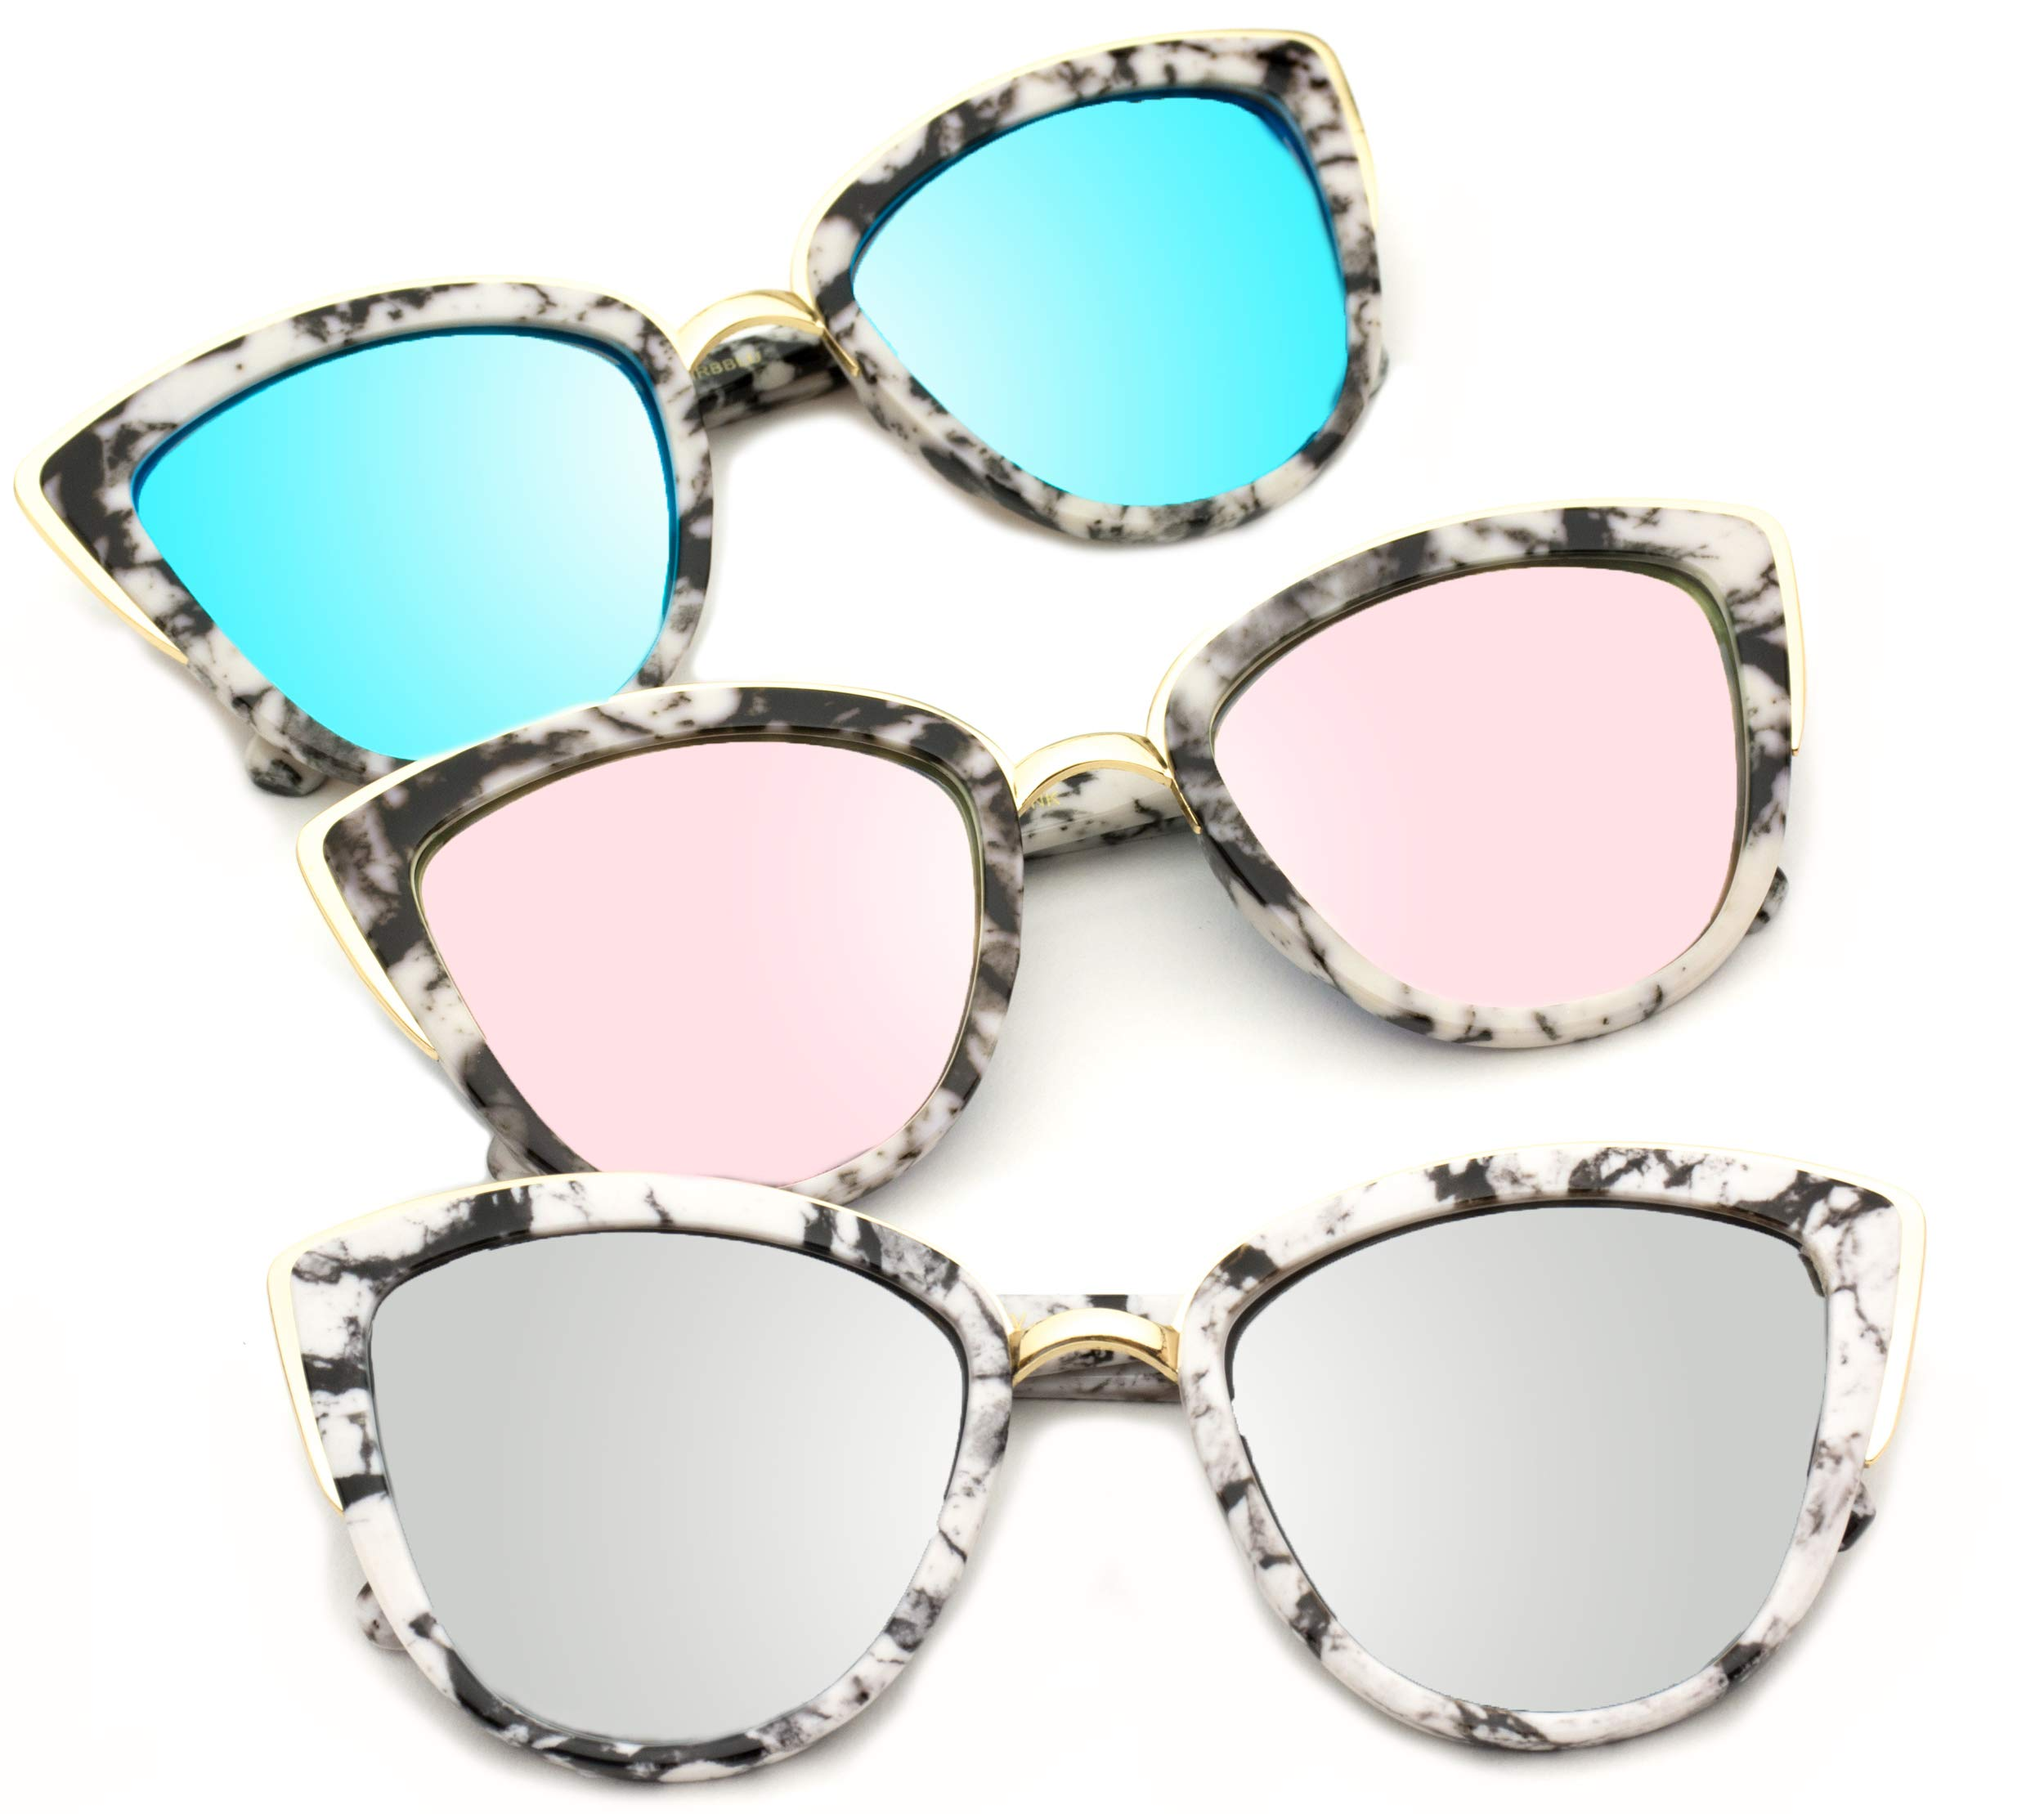 Womens Cat Eye Mirrored Revo Reflective Lenses Oversized Cateyes Sunglasses (Box: Mirror Purple/Mirror Blue/Mirror Silver, 54) by WearMe Pro (Image #2)